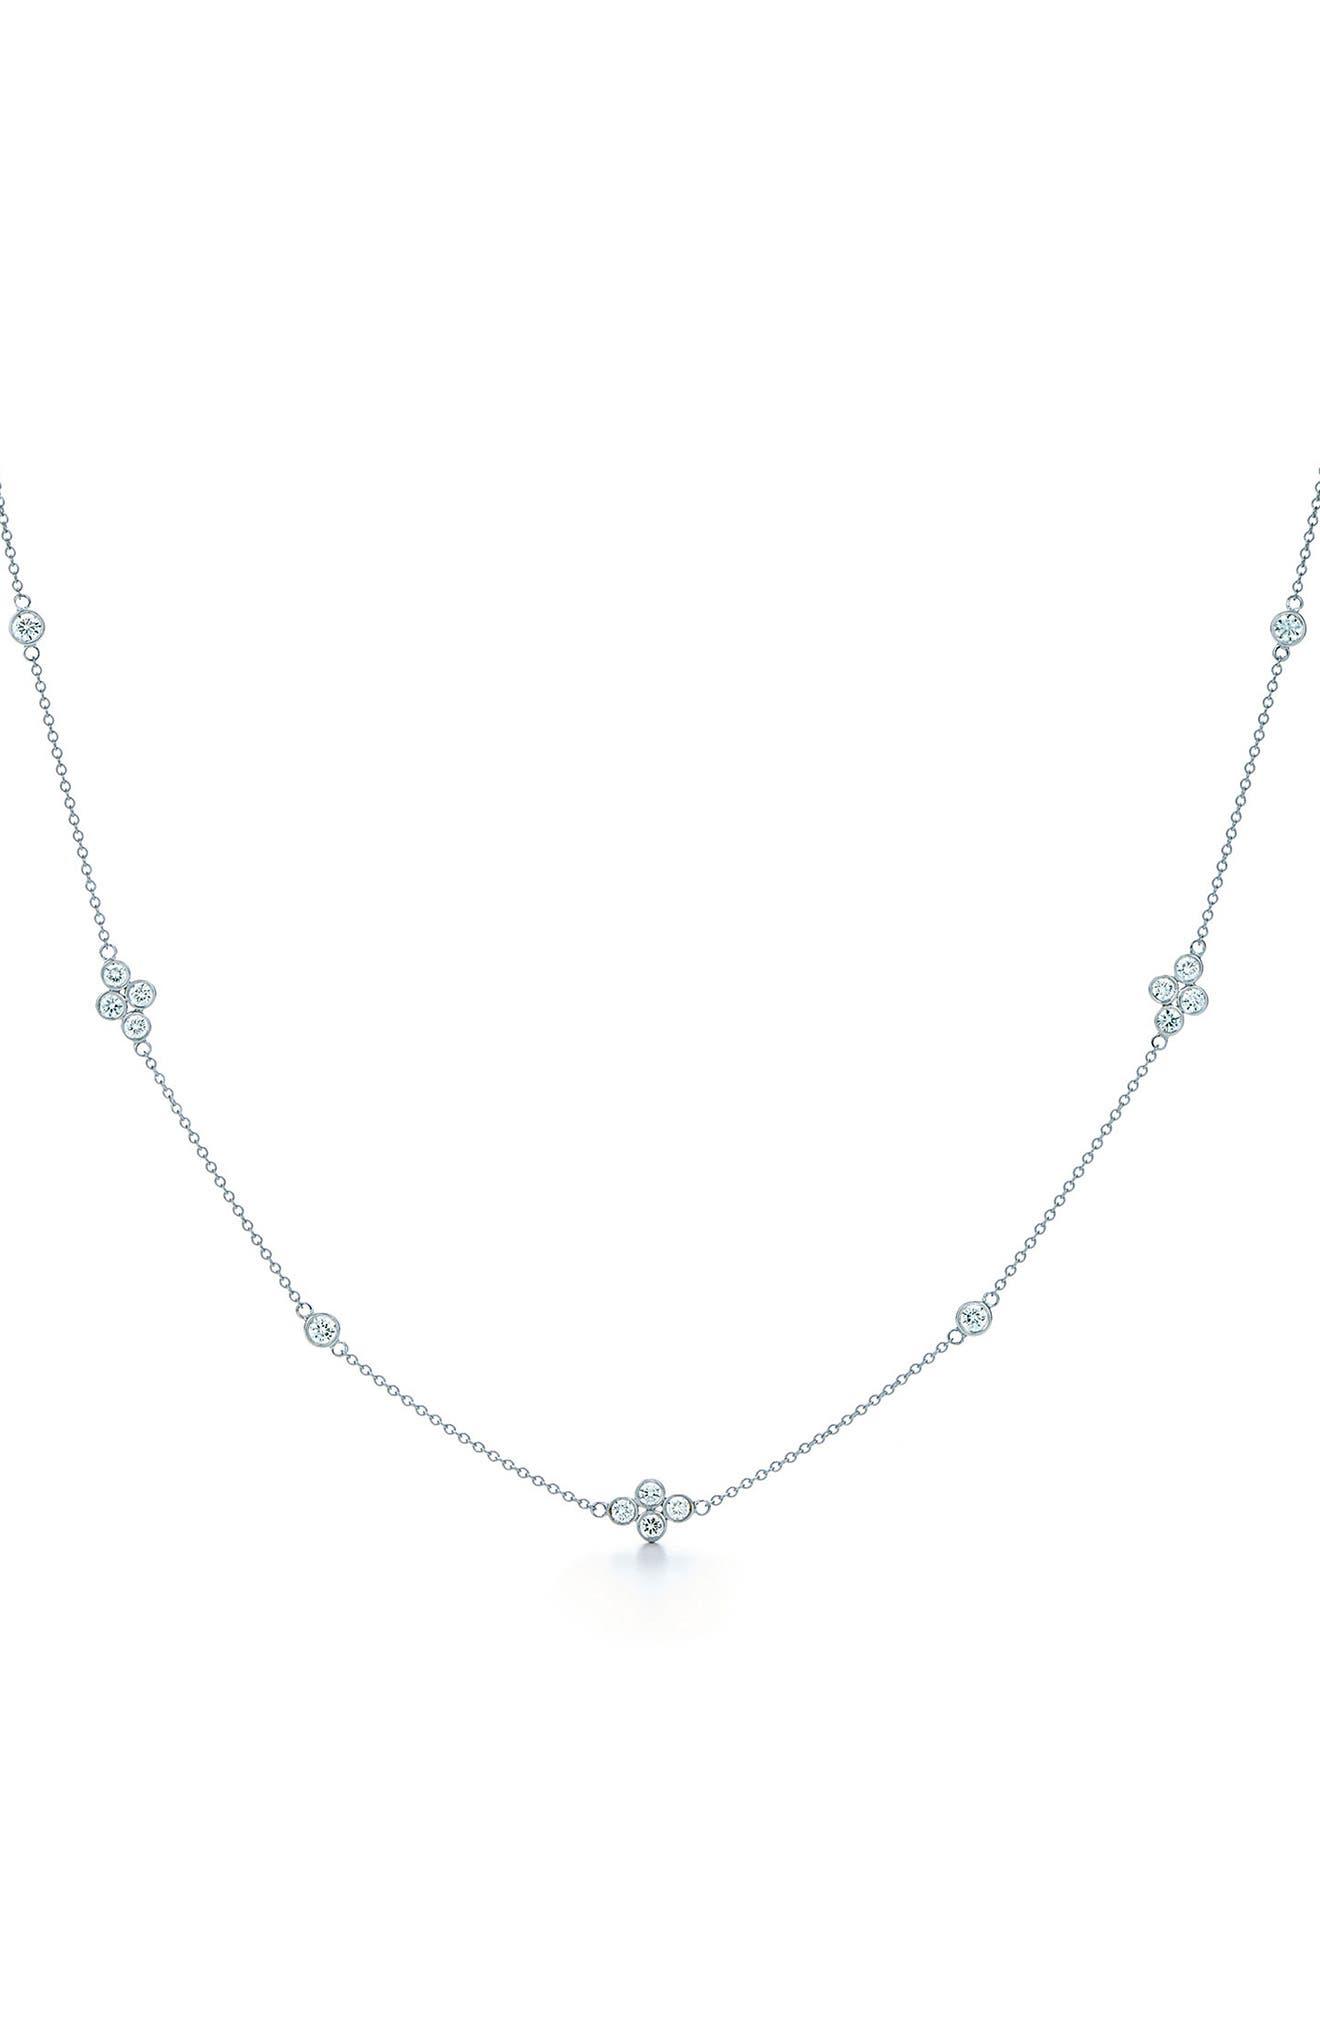 Diamond Collar Necklace,                             Main thumbnail 1, color,                             White Gold